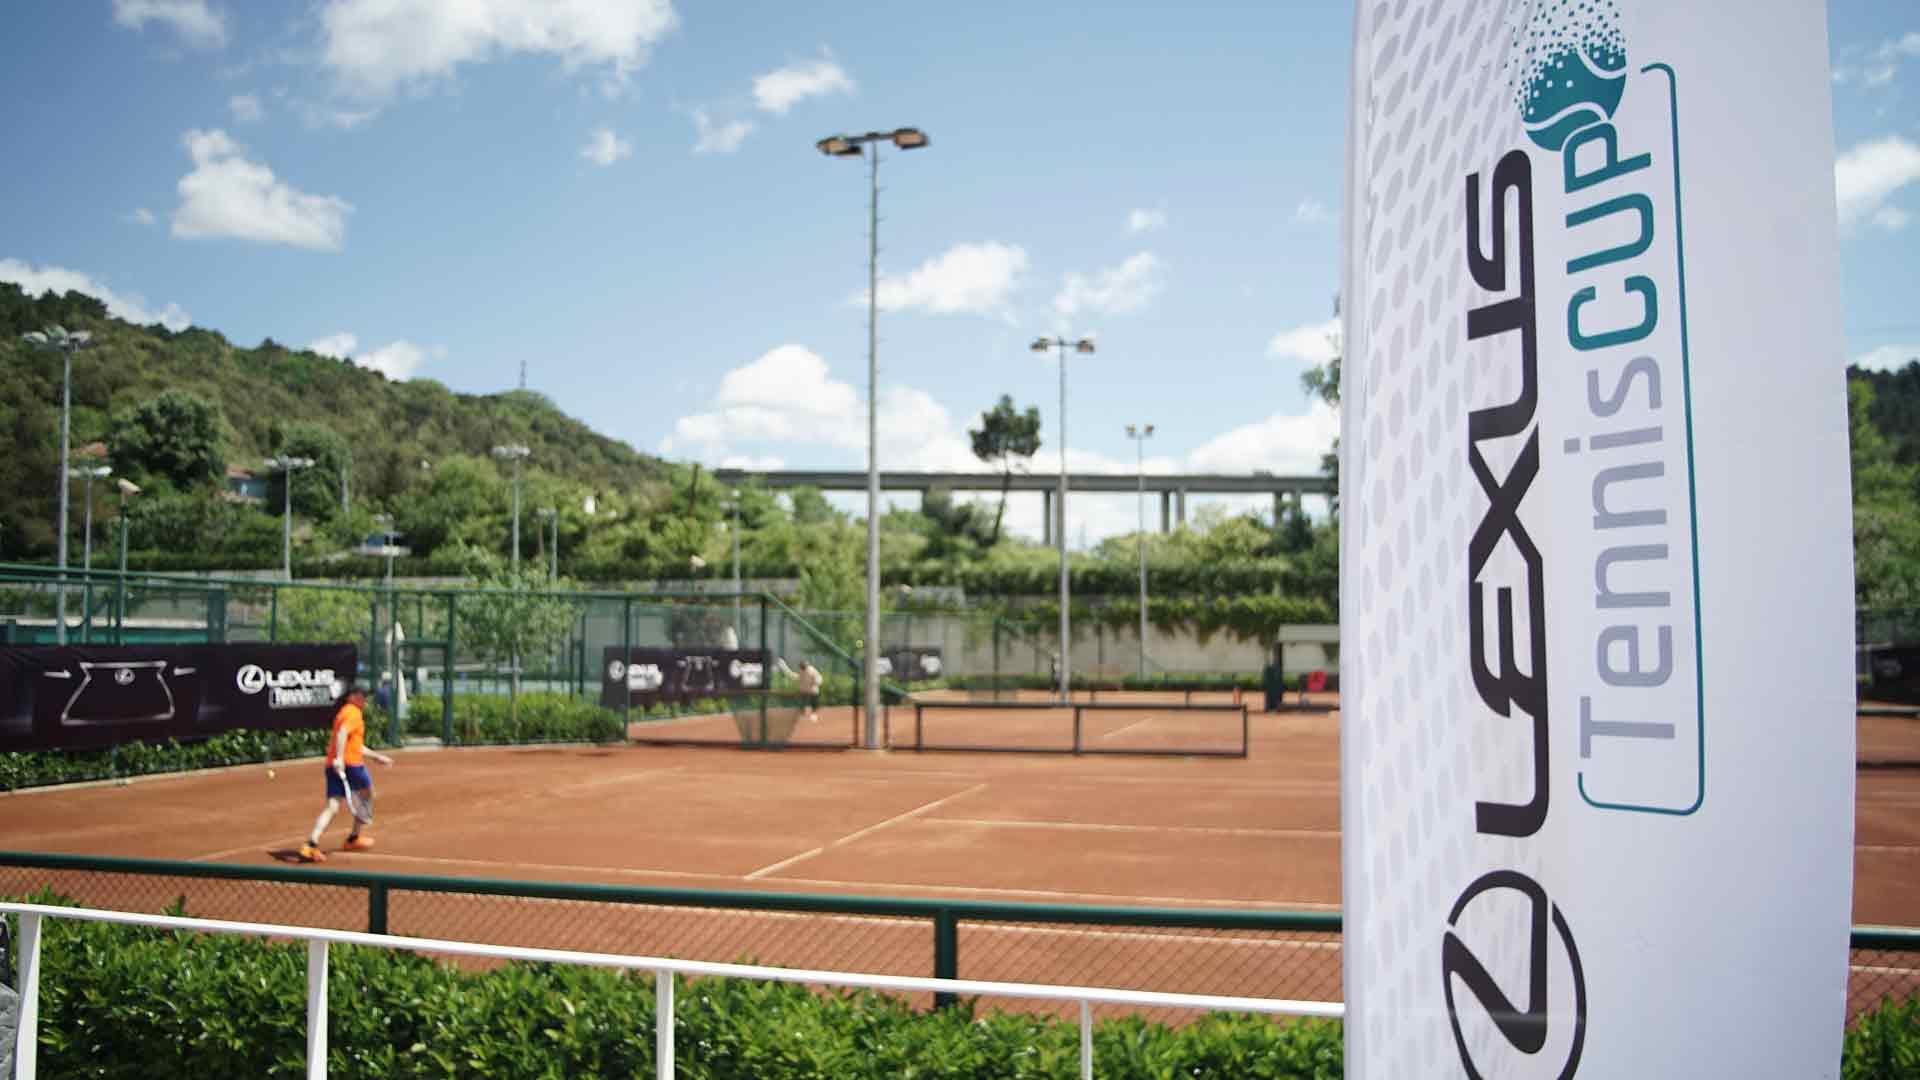 Lexus Tennis Cup gallery02